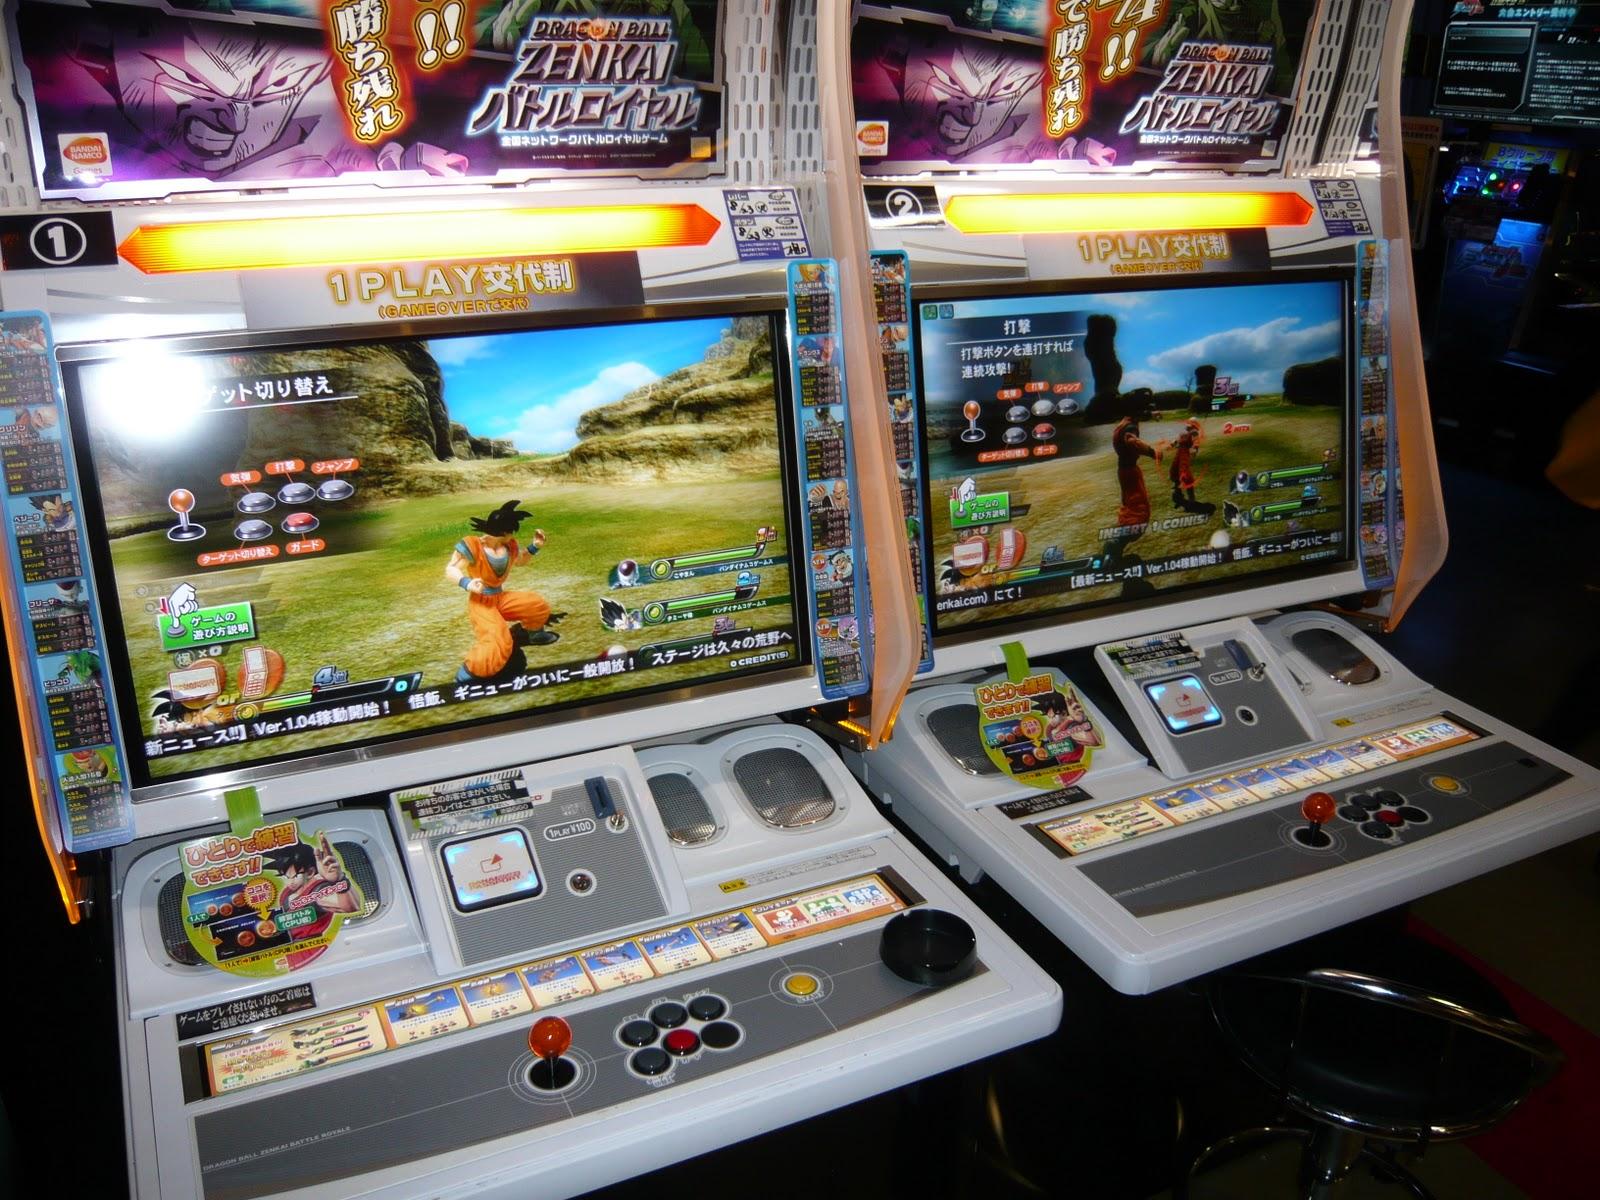 Japan, Arcades & Gaming: Ikebukuro Arcade Game Centres